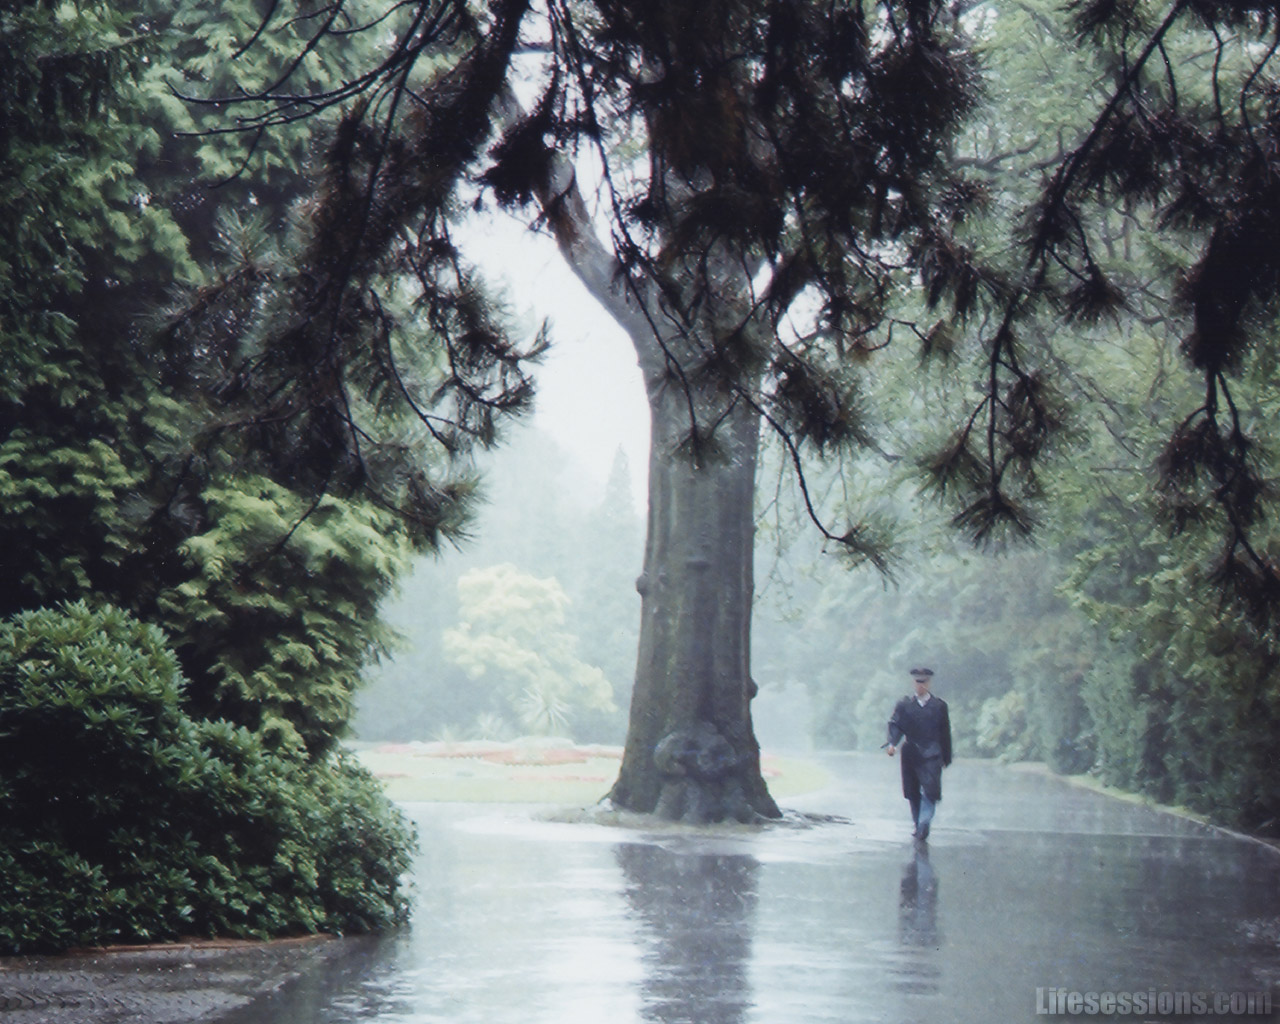 https://4.bp.blogspot.com/-jS2Vu1PsPb8/TmD3Y96AEDI/AAAAAAAABg0/thsV35EIZIc/s1600/rain1.jpg